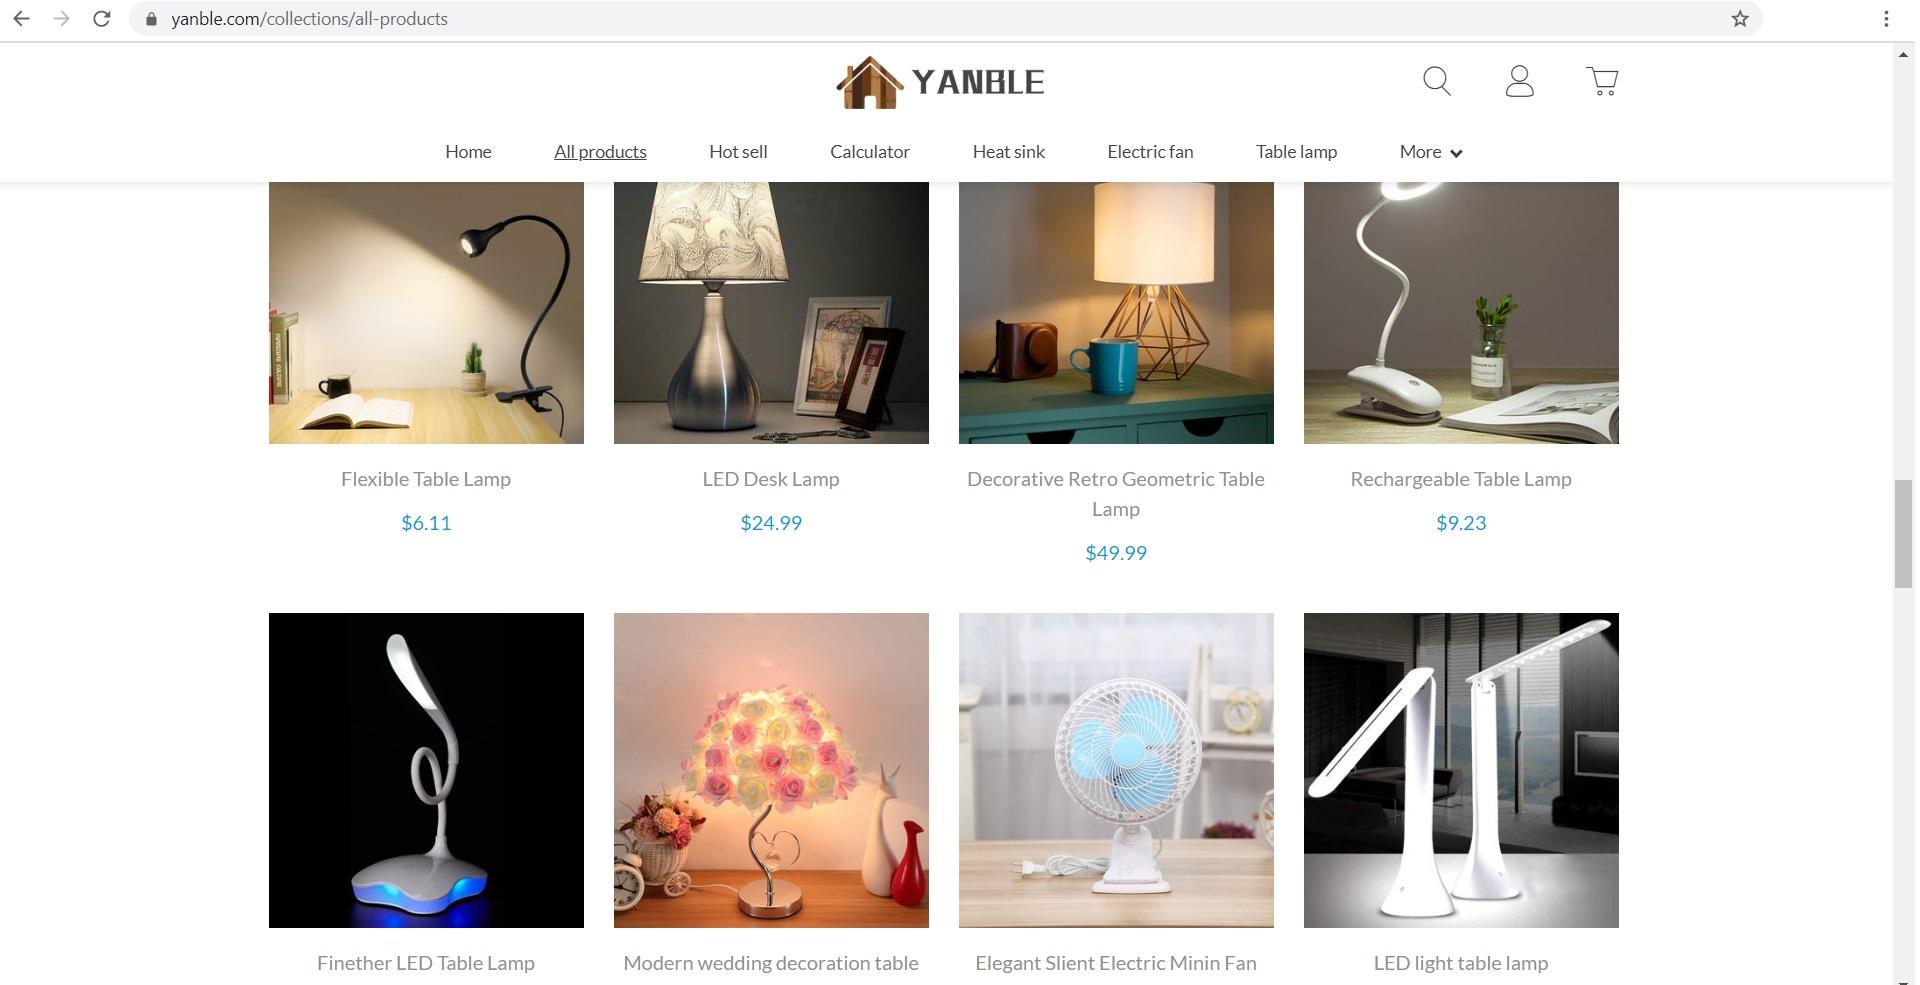 yanble.com